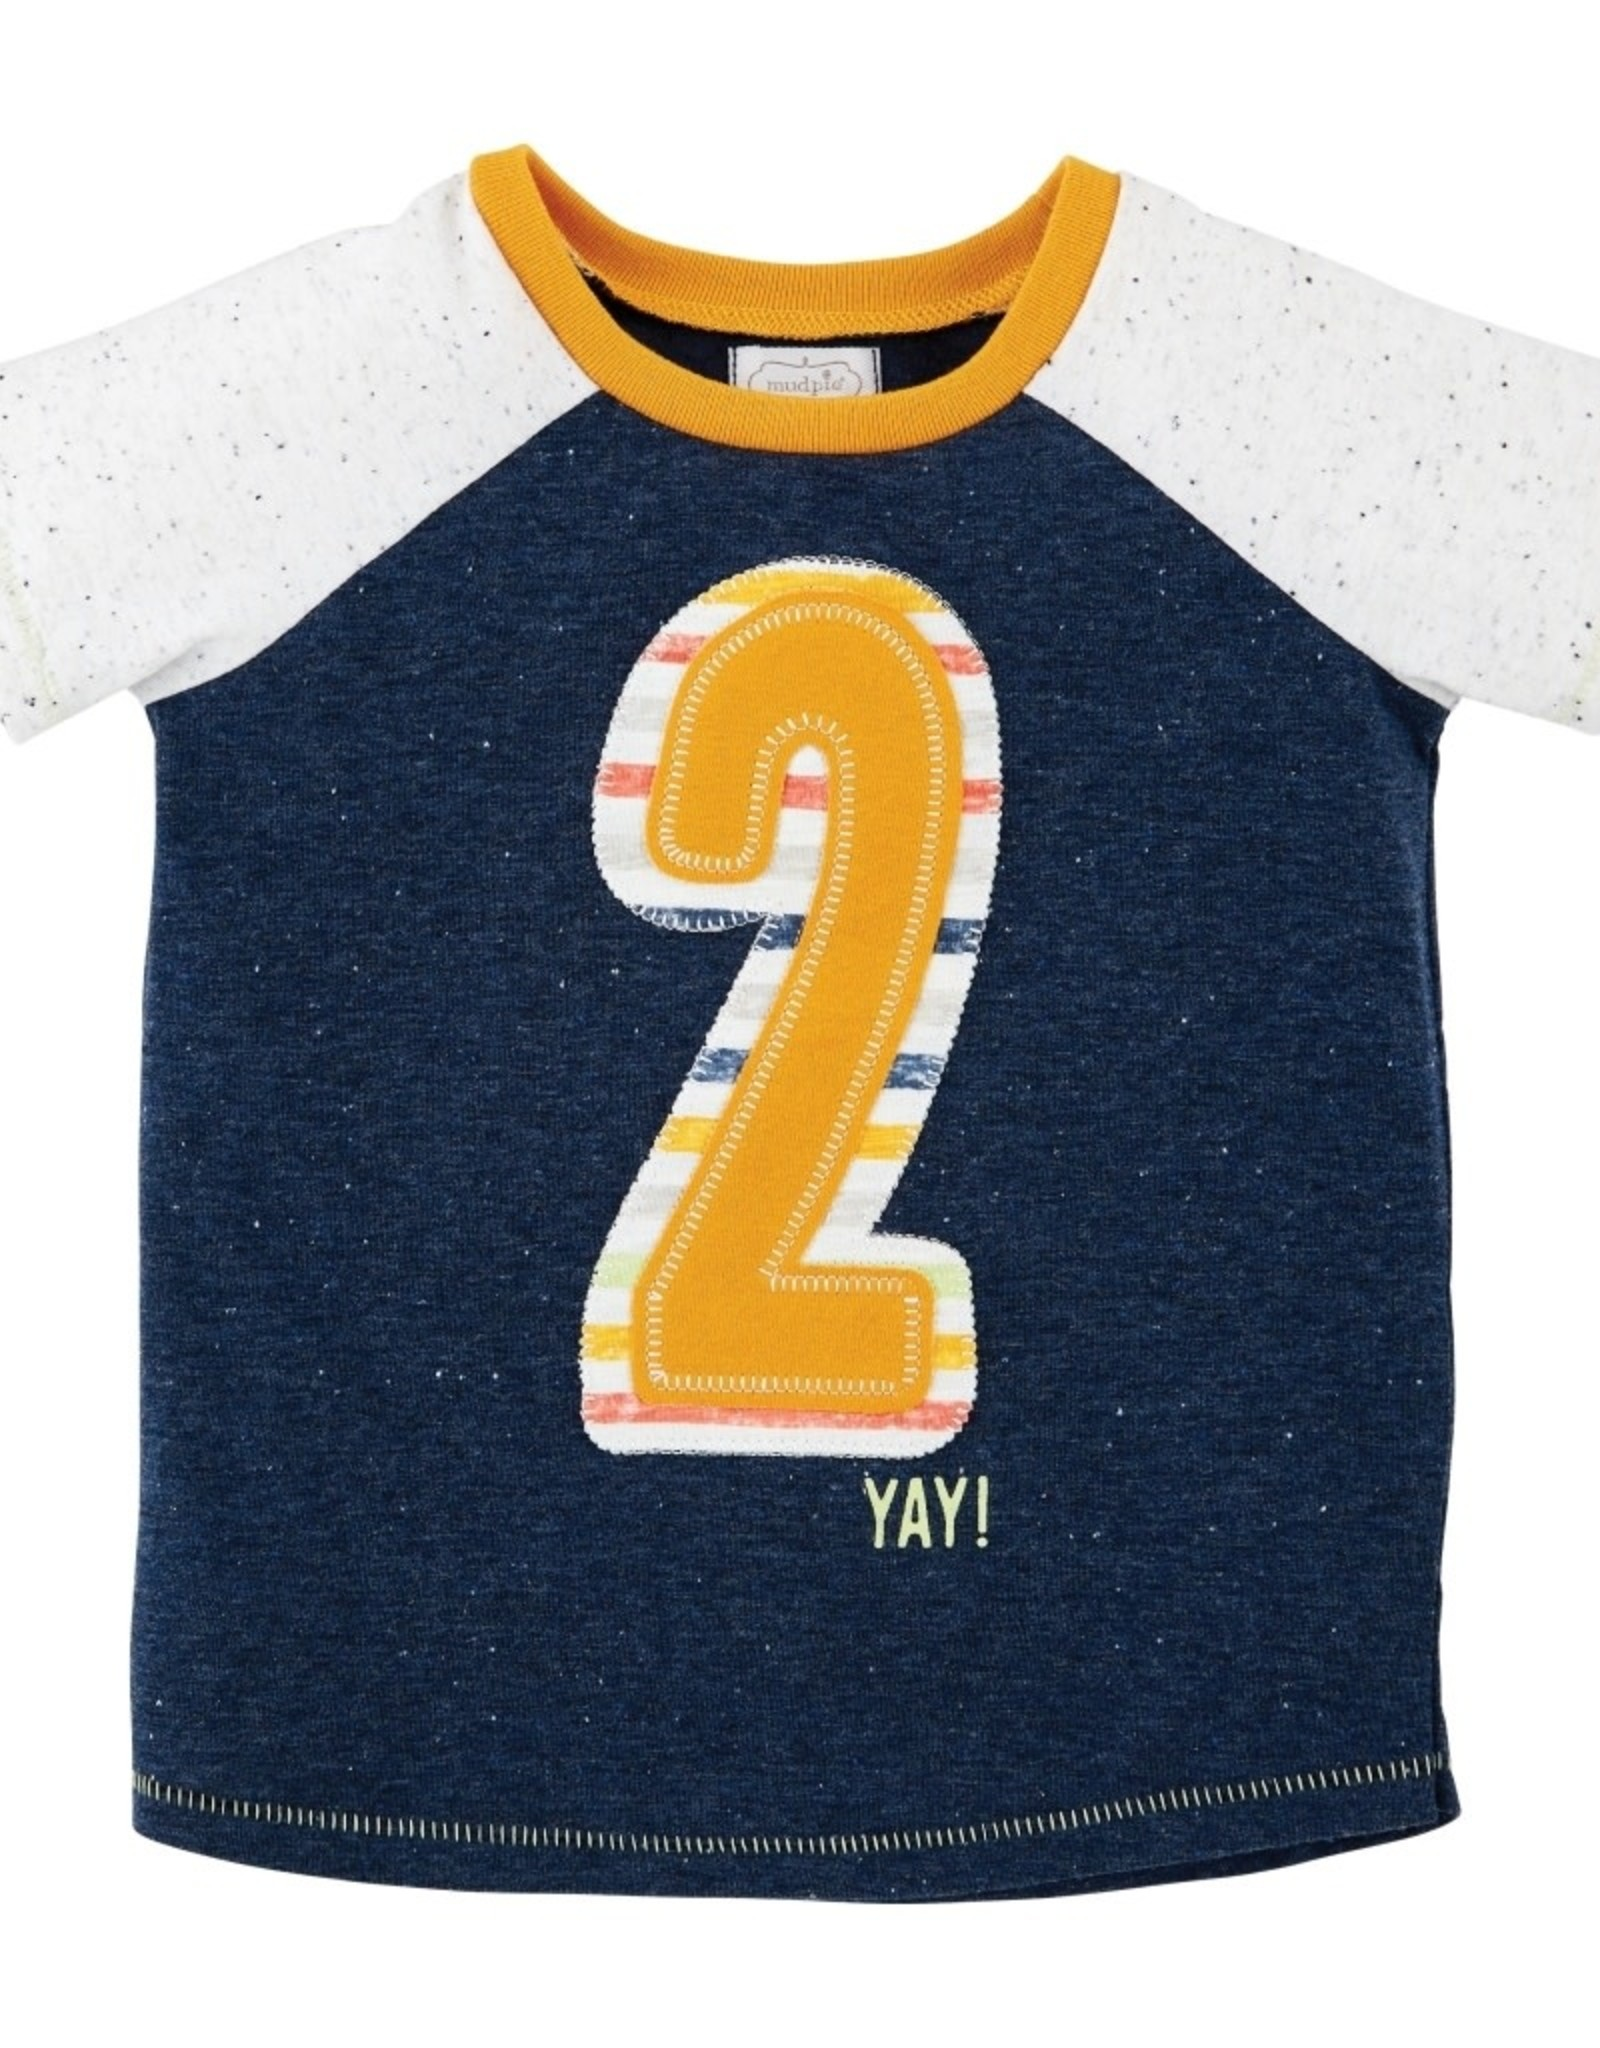 2 Birthday Shirt 24m/2t